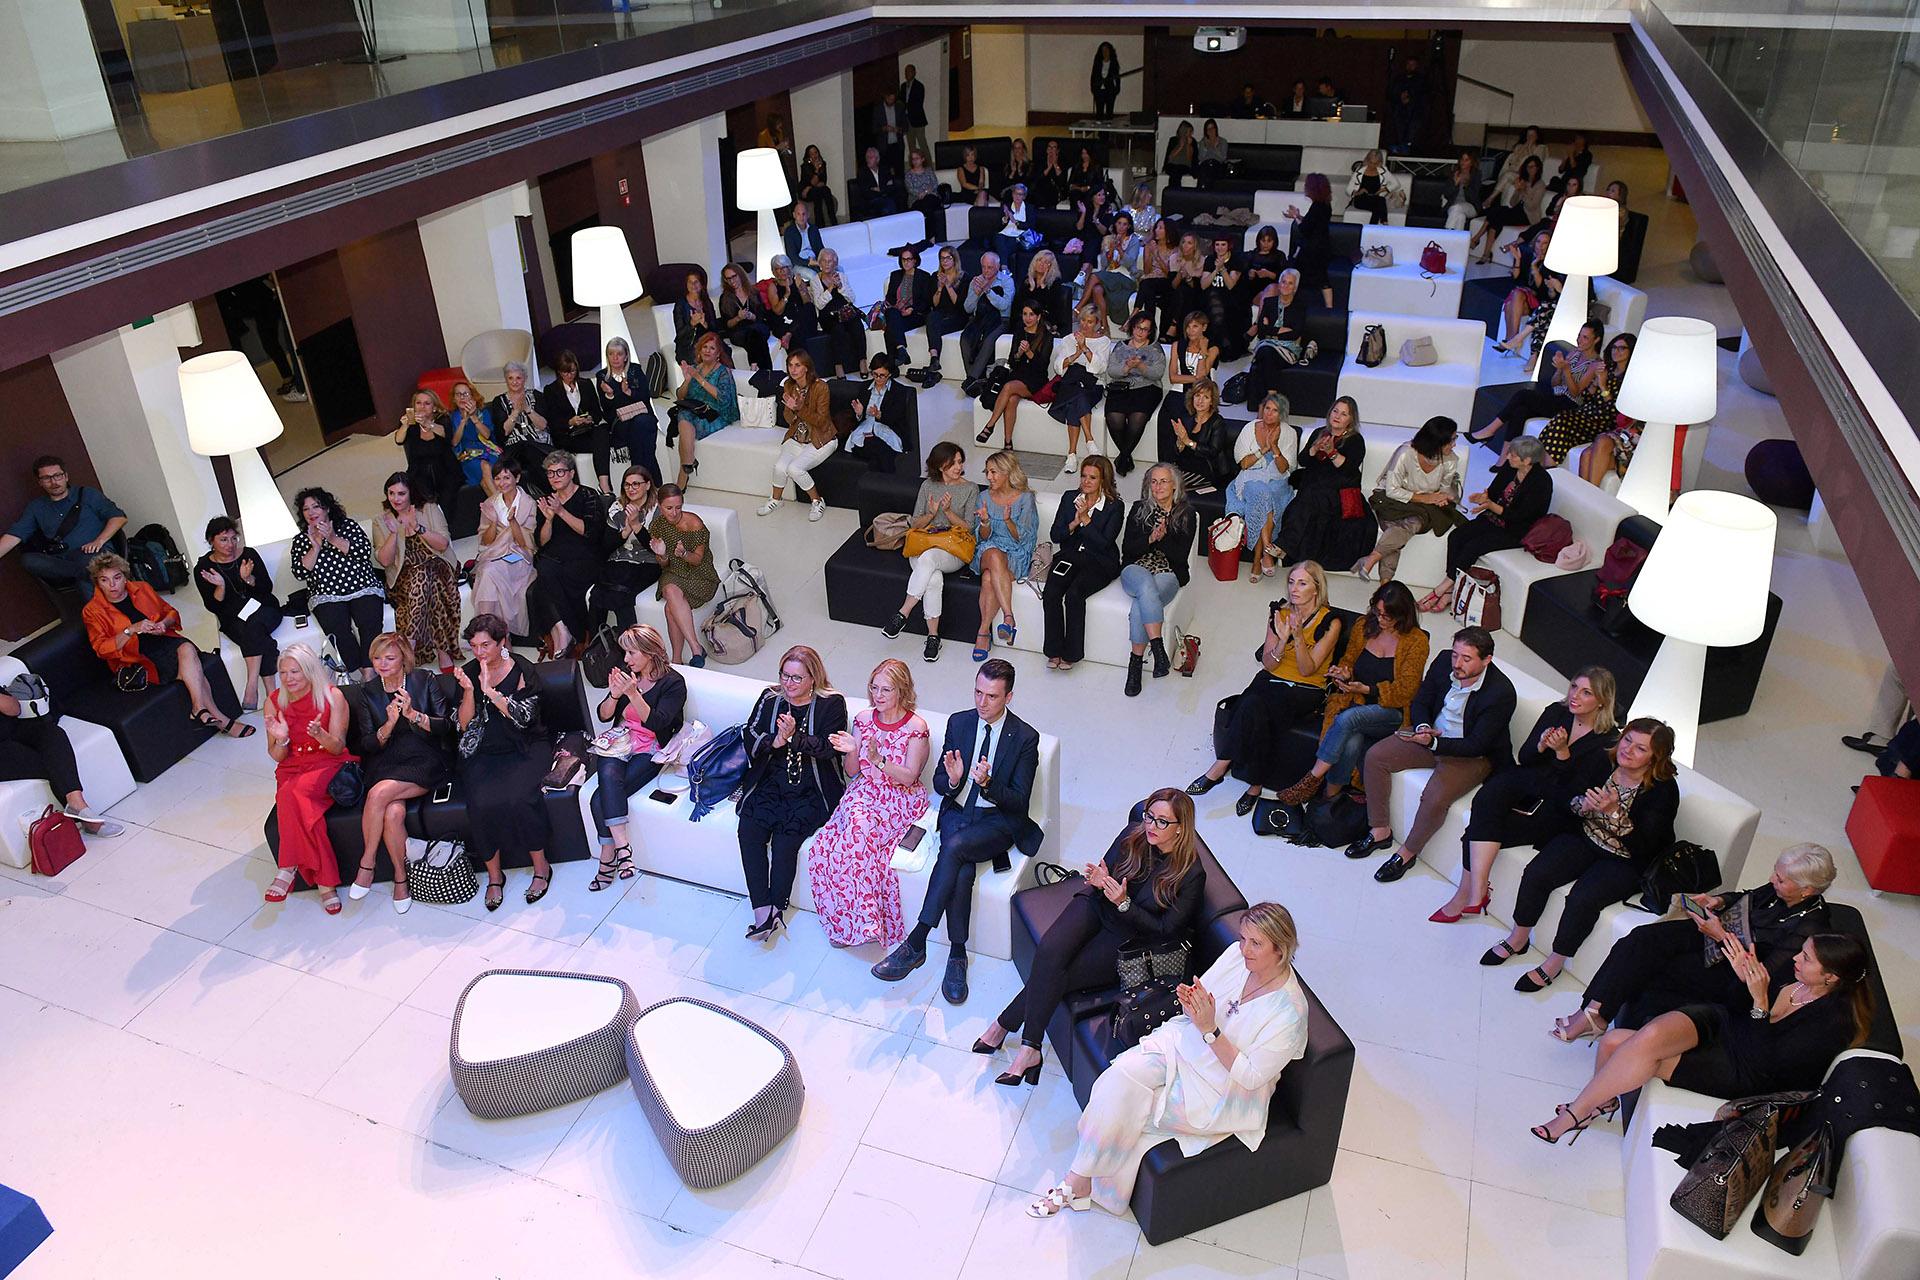 Convention Confartigianato Donne Impresa 2019 Caseificio Castellan Urbano